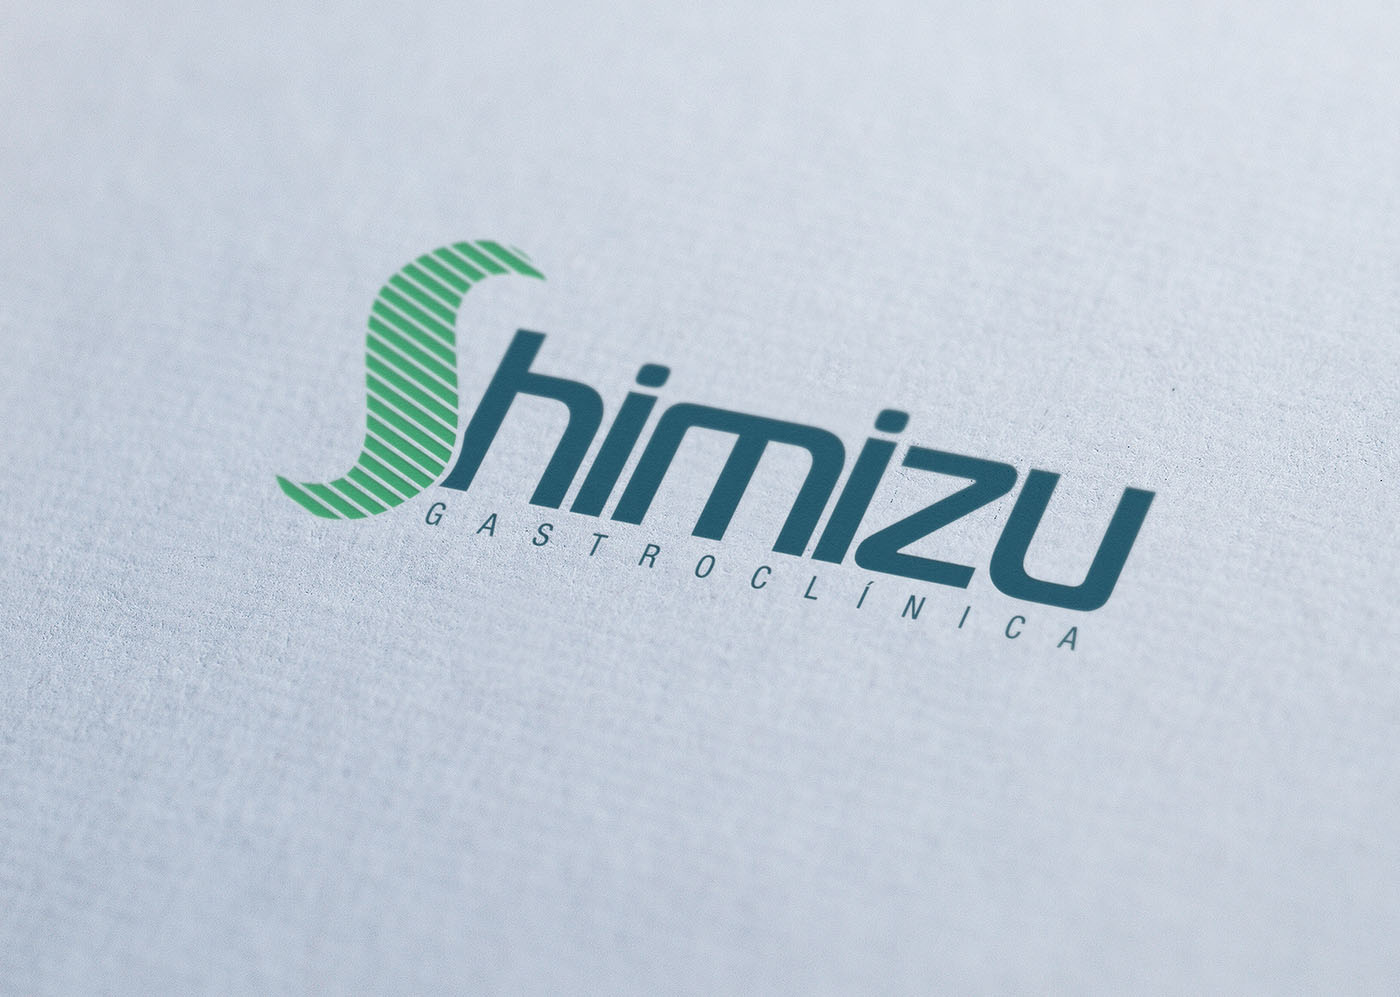 Branding Shimizu Gastroclínica 7